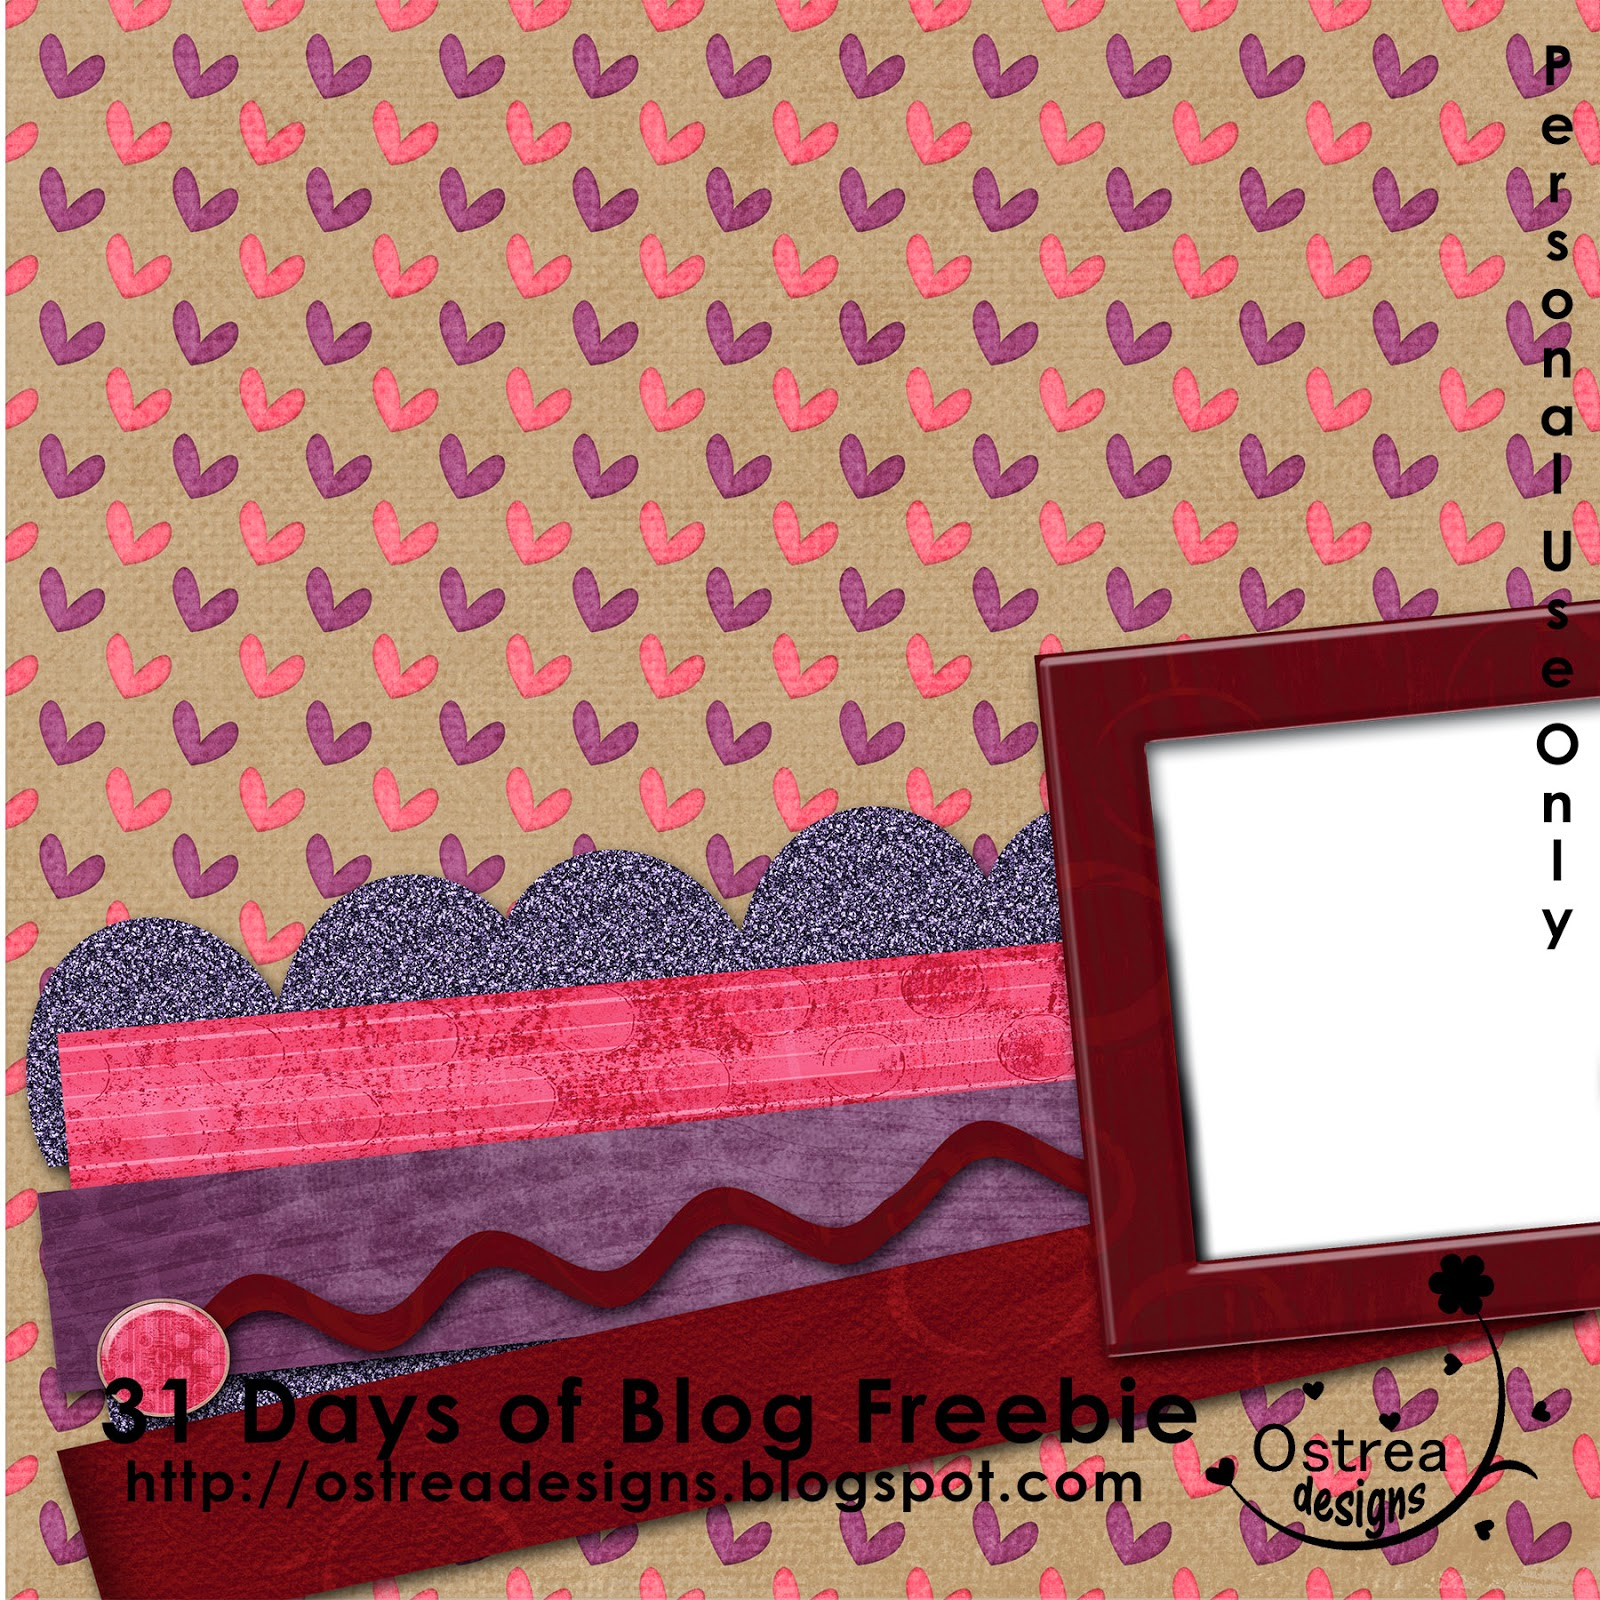 http://1.bp.blogspot.com/-71RXrrQt6Uk/VHd7t--2WTI/AAAAAAAABks/h4QhV4eZF5E/s1600/OstreaDesigns_Dec31p.jpg